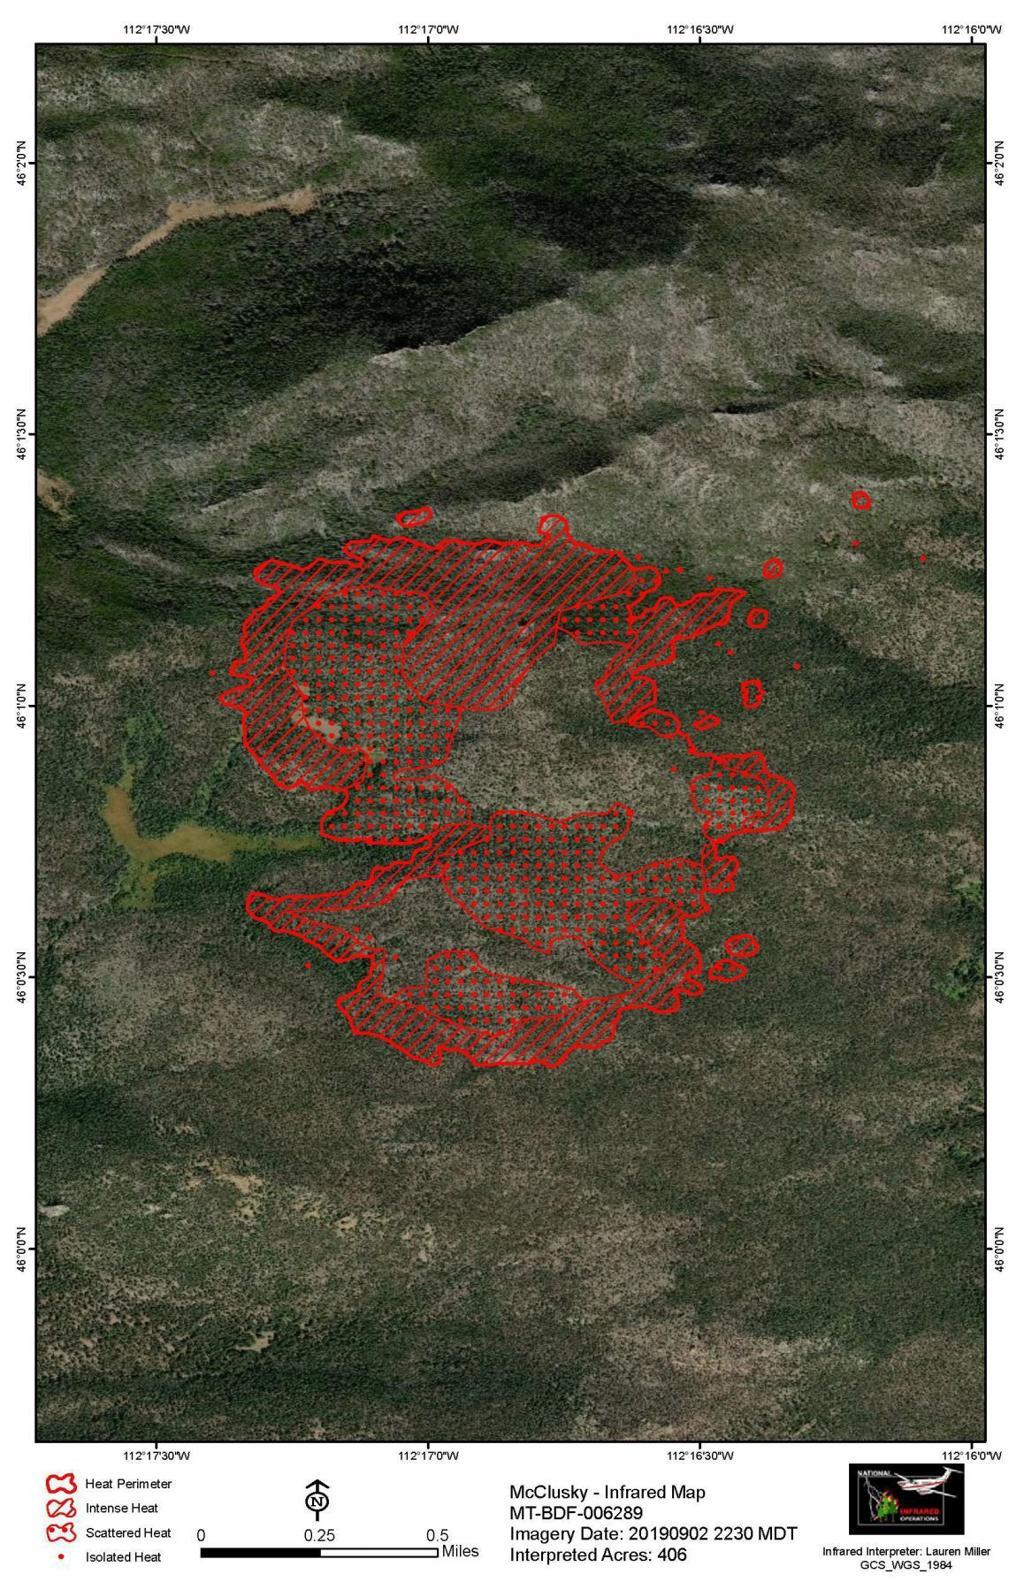 montana fires 2020 map